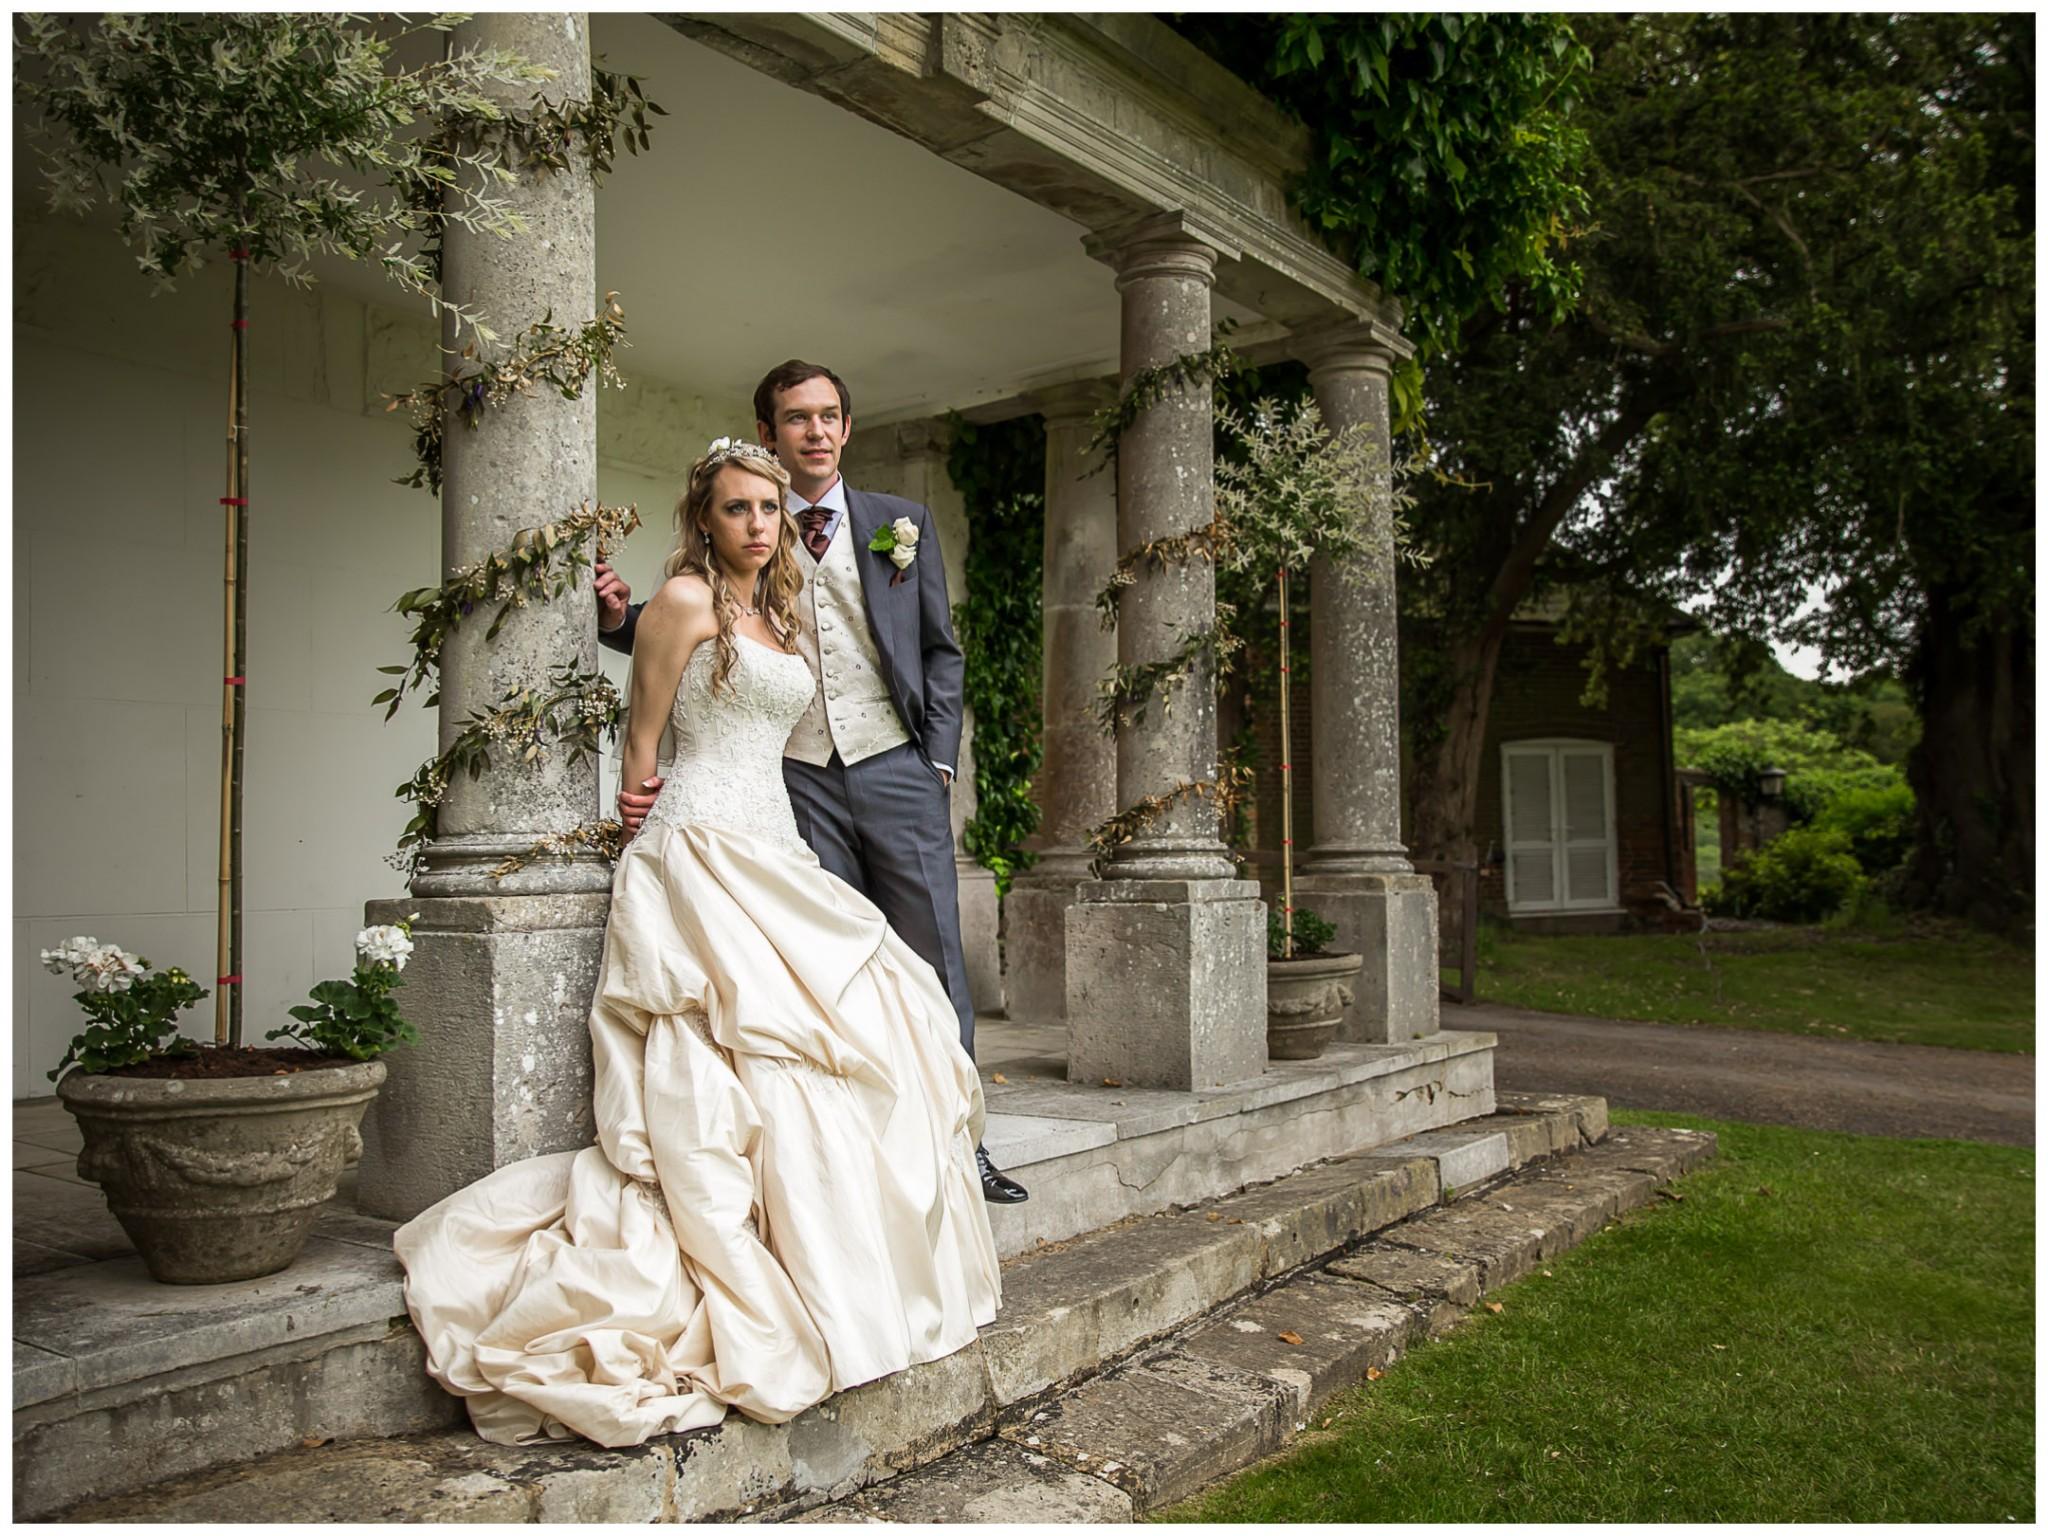 Highfield Park Wedding Photography Bride and Groom by pillar